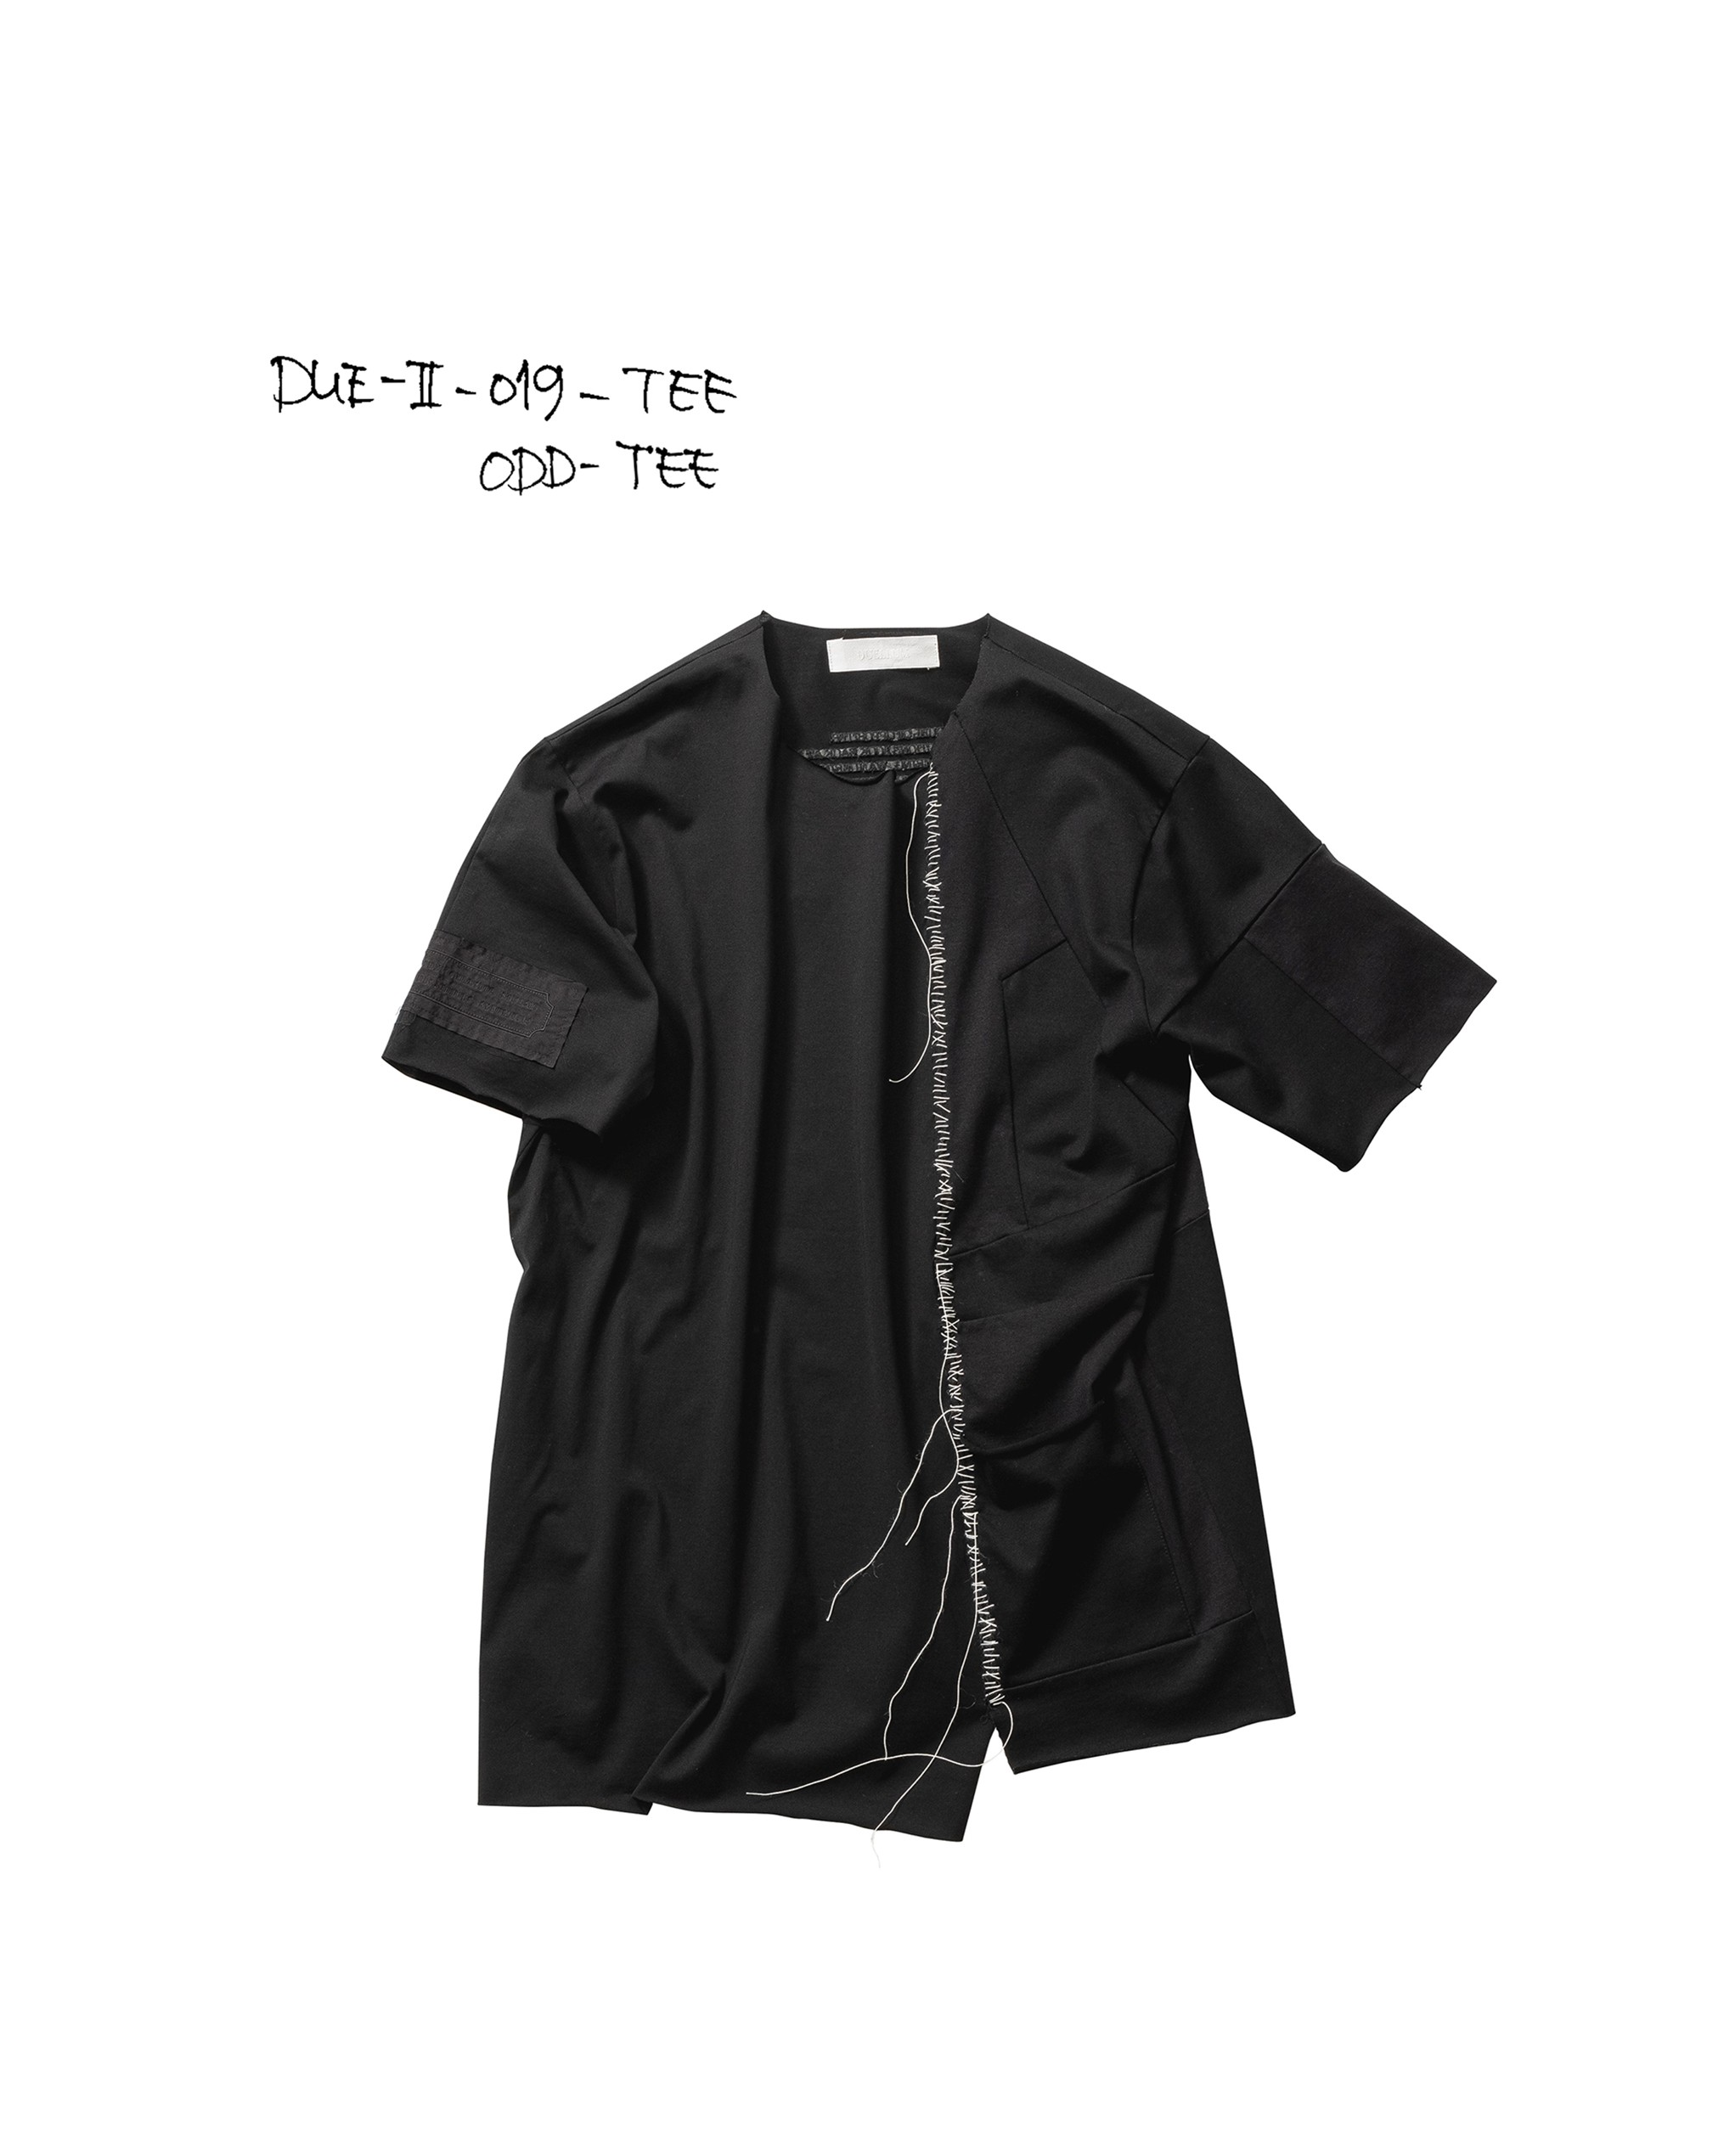 21SS DUE-Ⅱ-019-TEE-BLK ODD TEE